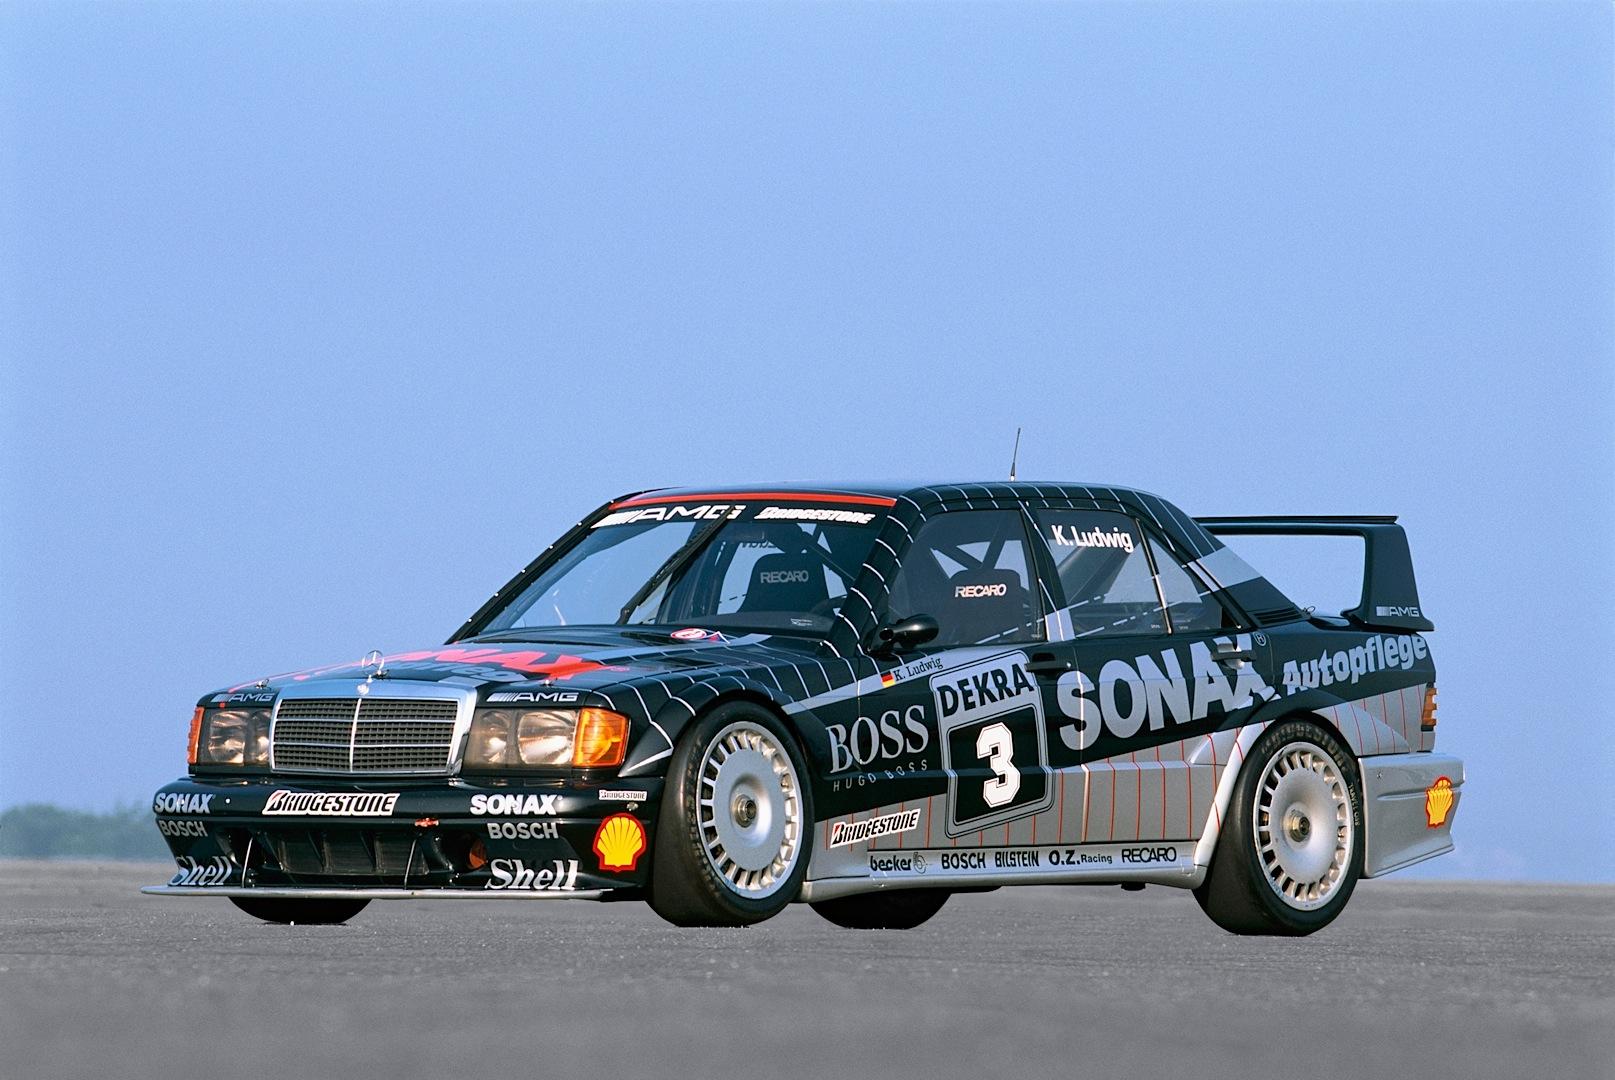 A short history of the mercedes benz c class in dtm for Mercedes benz car history